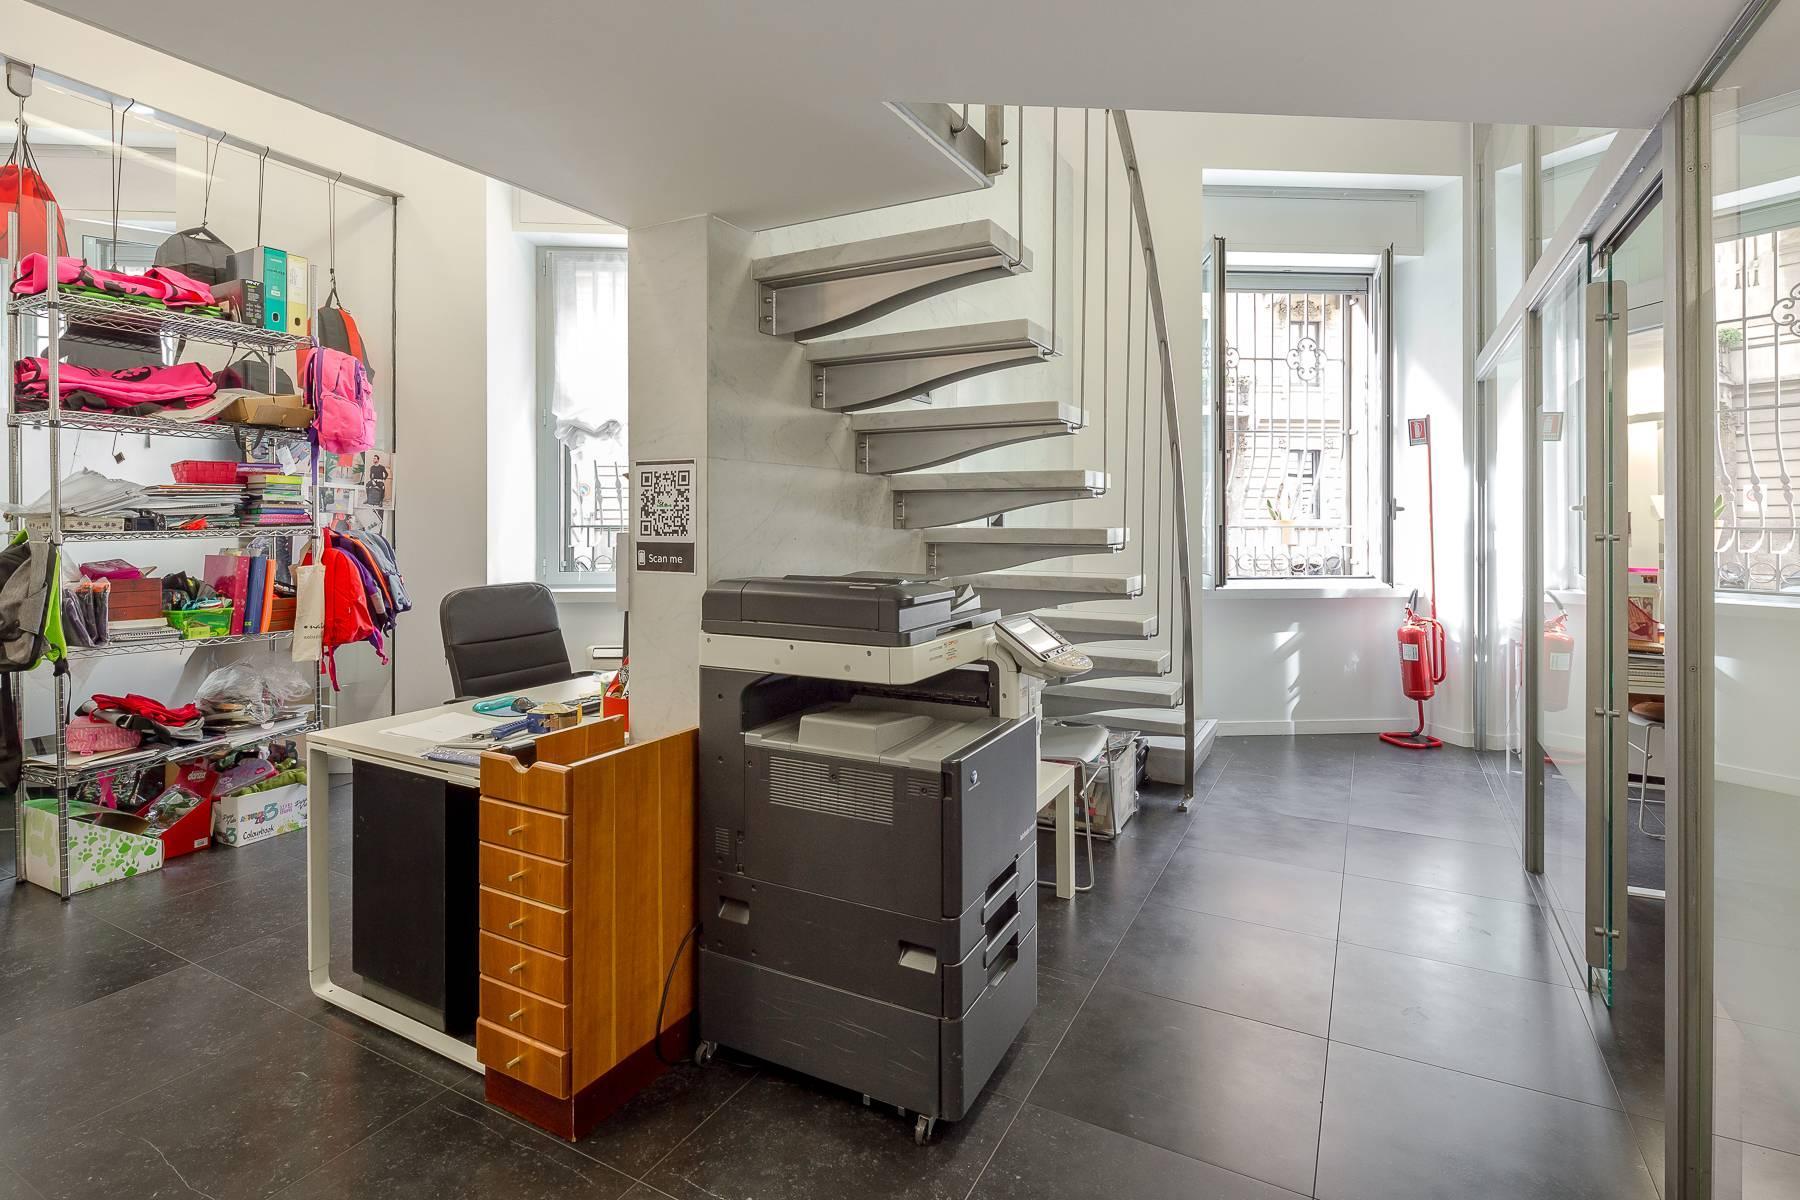 Open space office/residential property in Piazza Giovine Italia/Via Aurelio Saffi - 10